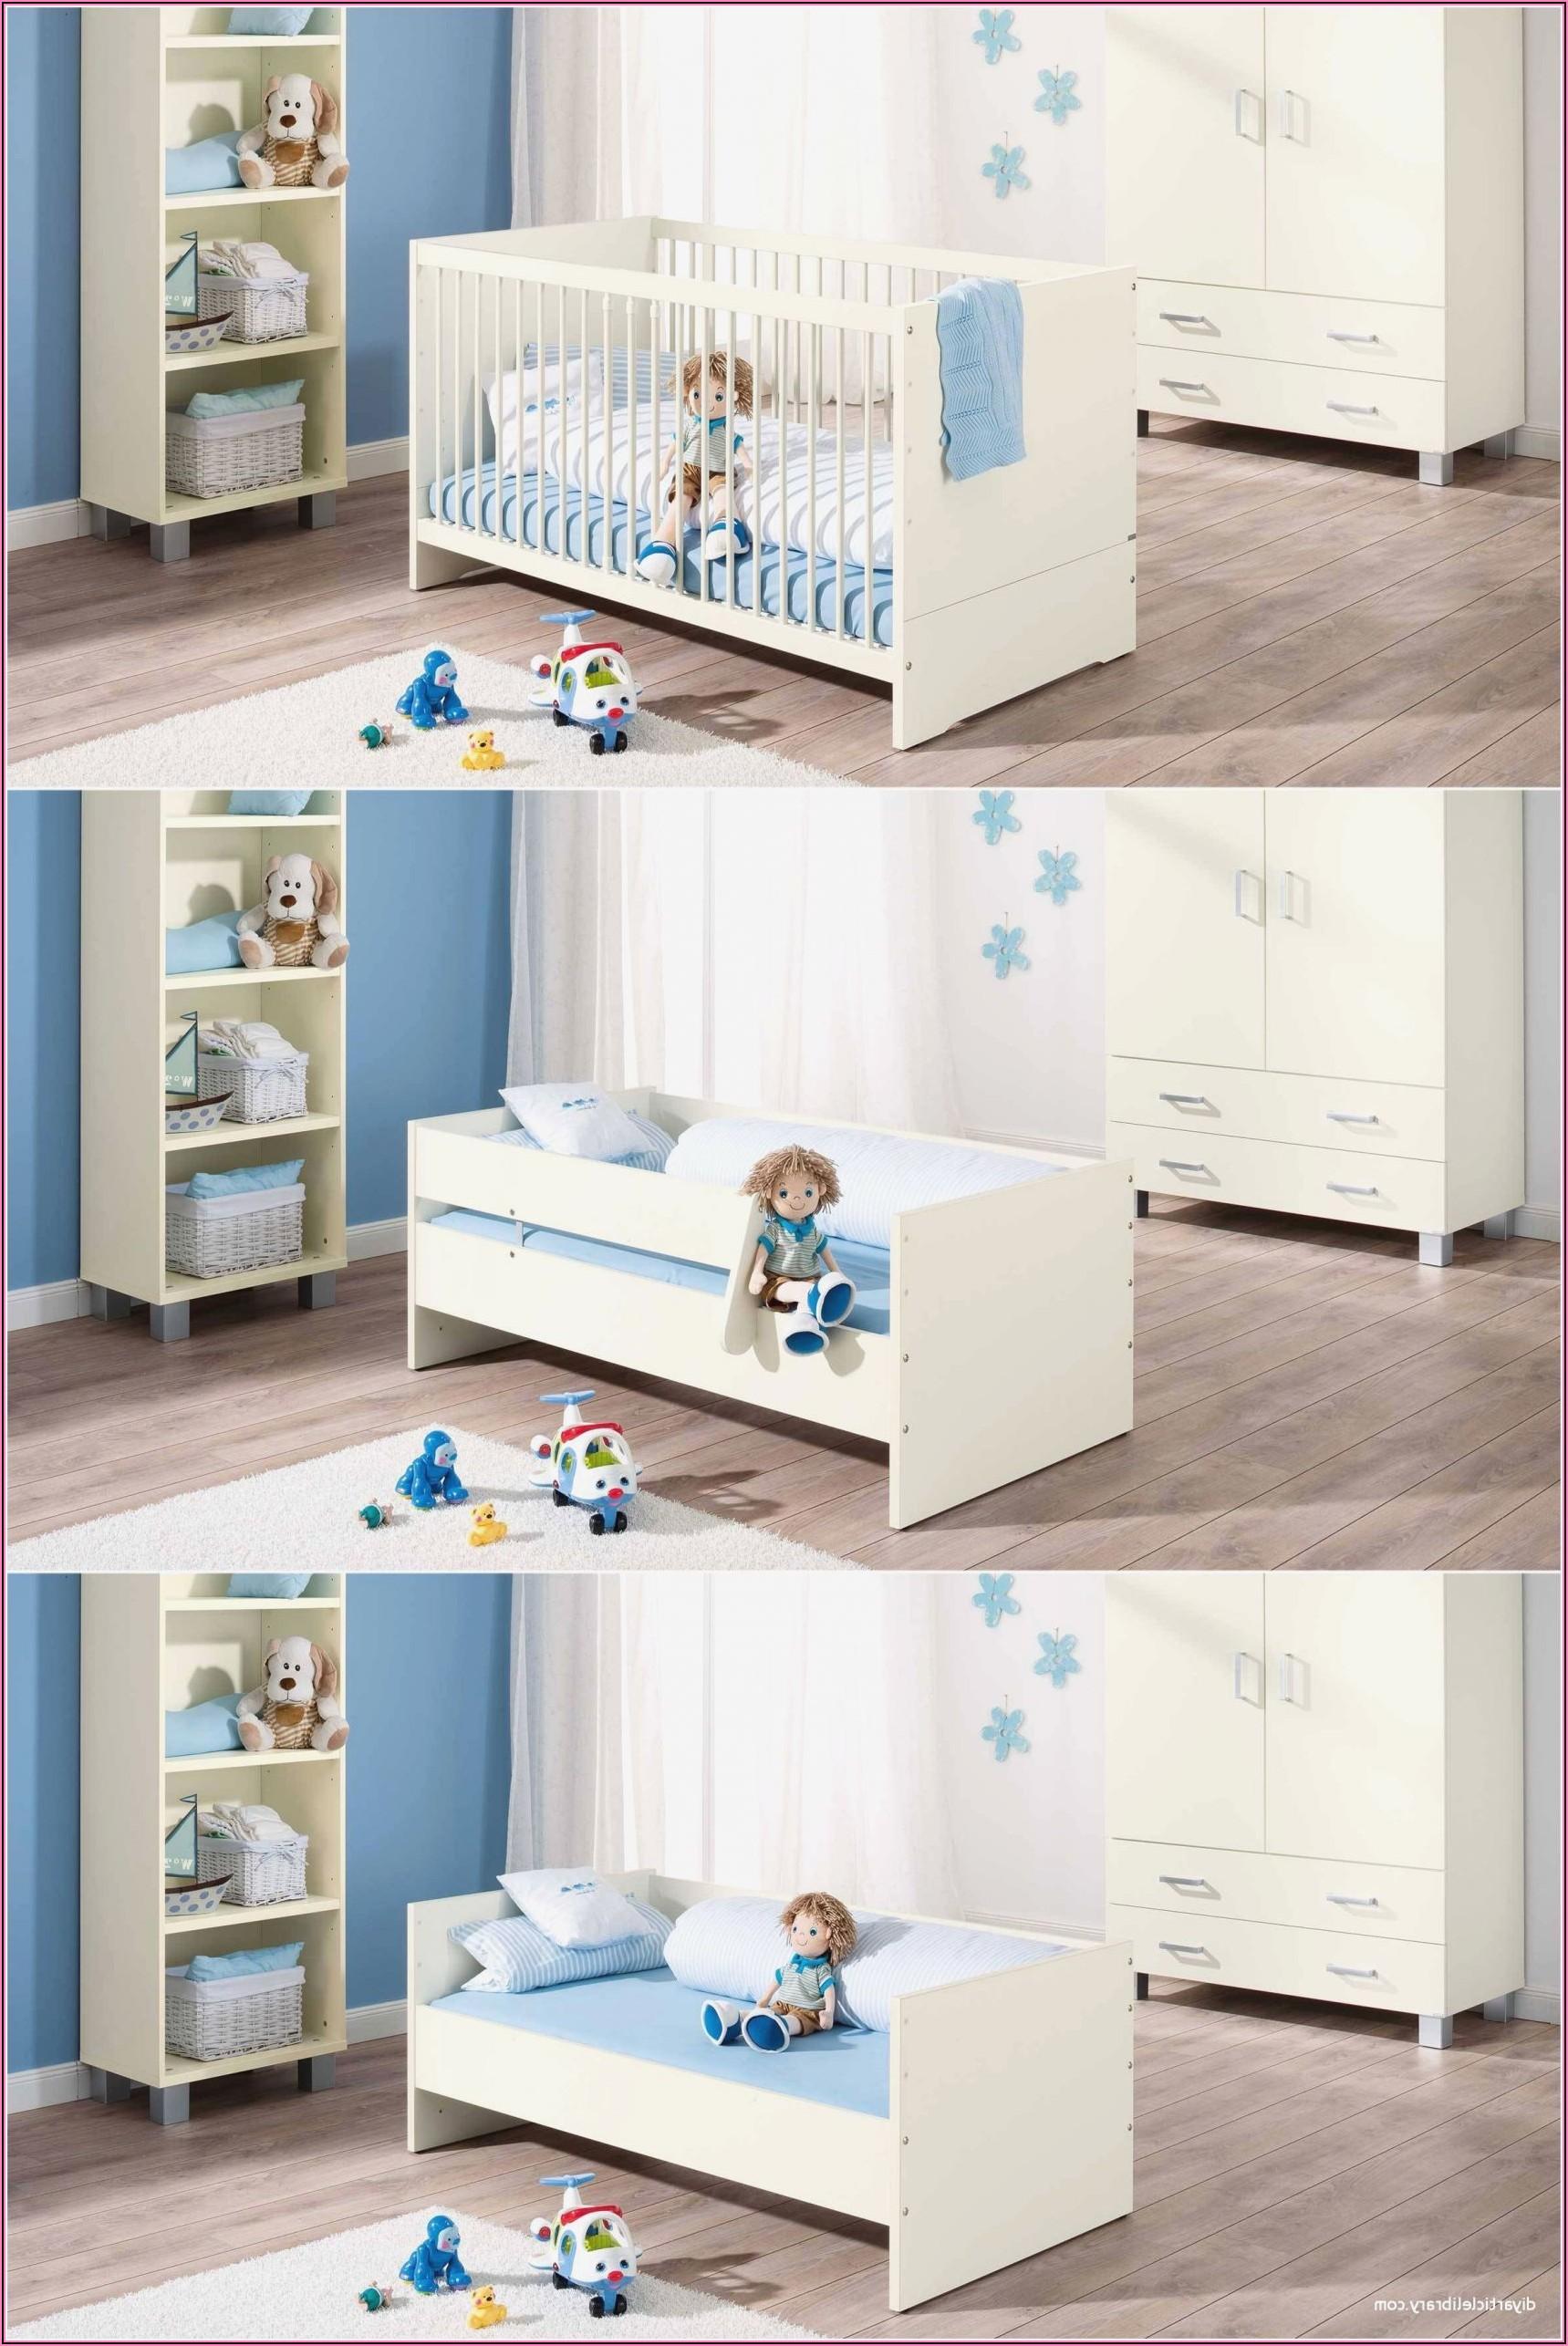 Paidi Kinderzimmer Arne Aufbauanleitung